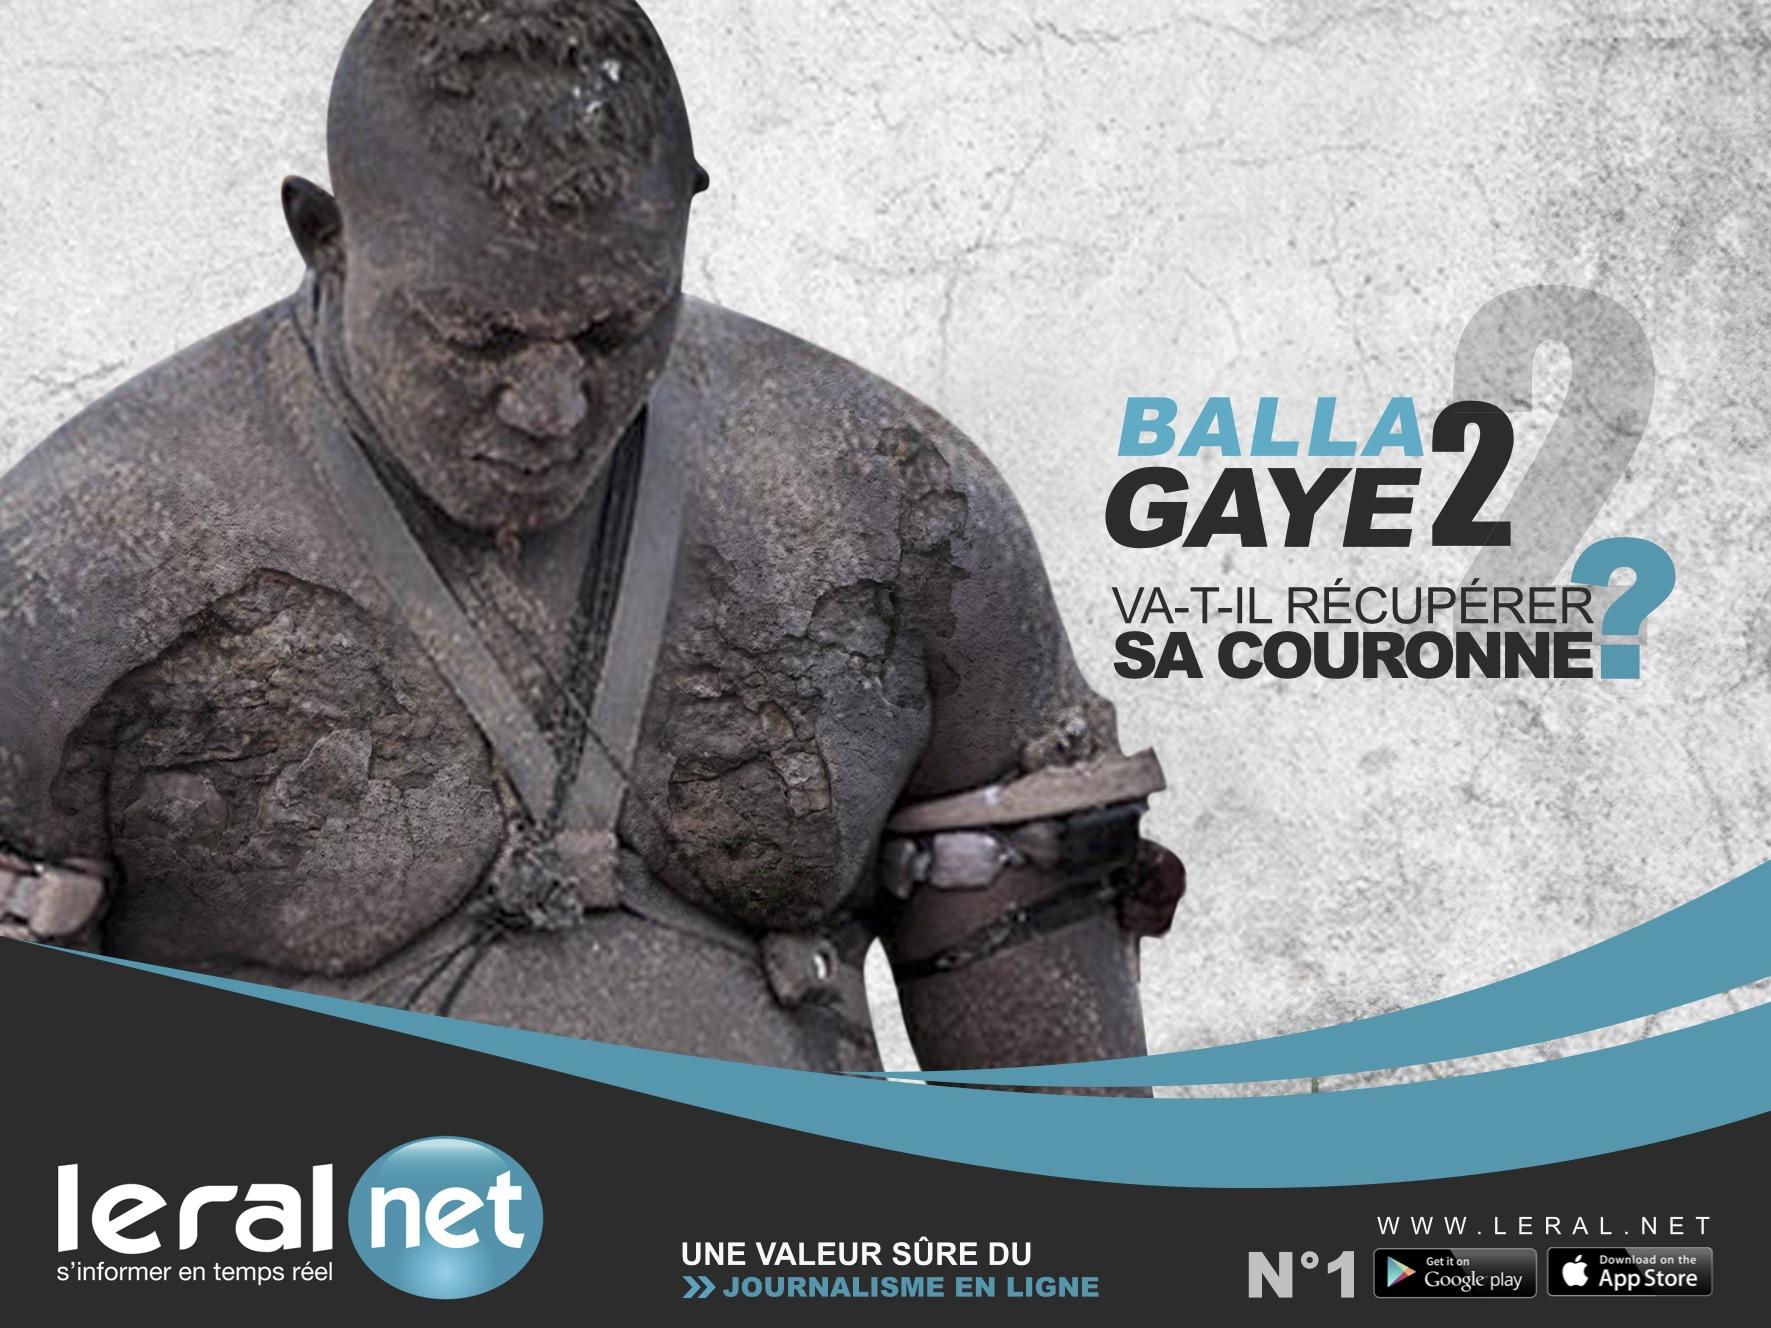 Prospective Leral.net : Balla Gaye 2 va-t-il récupérer sa couronne ?